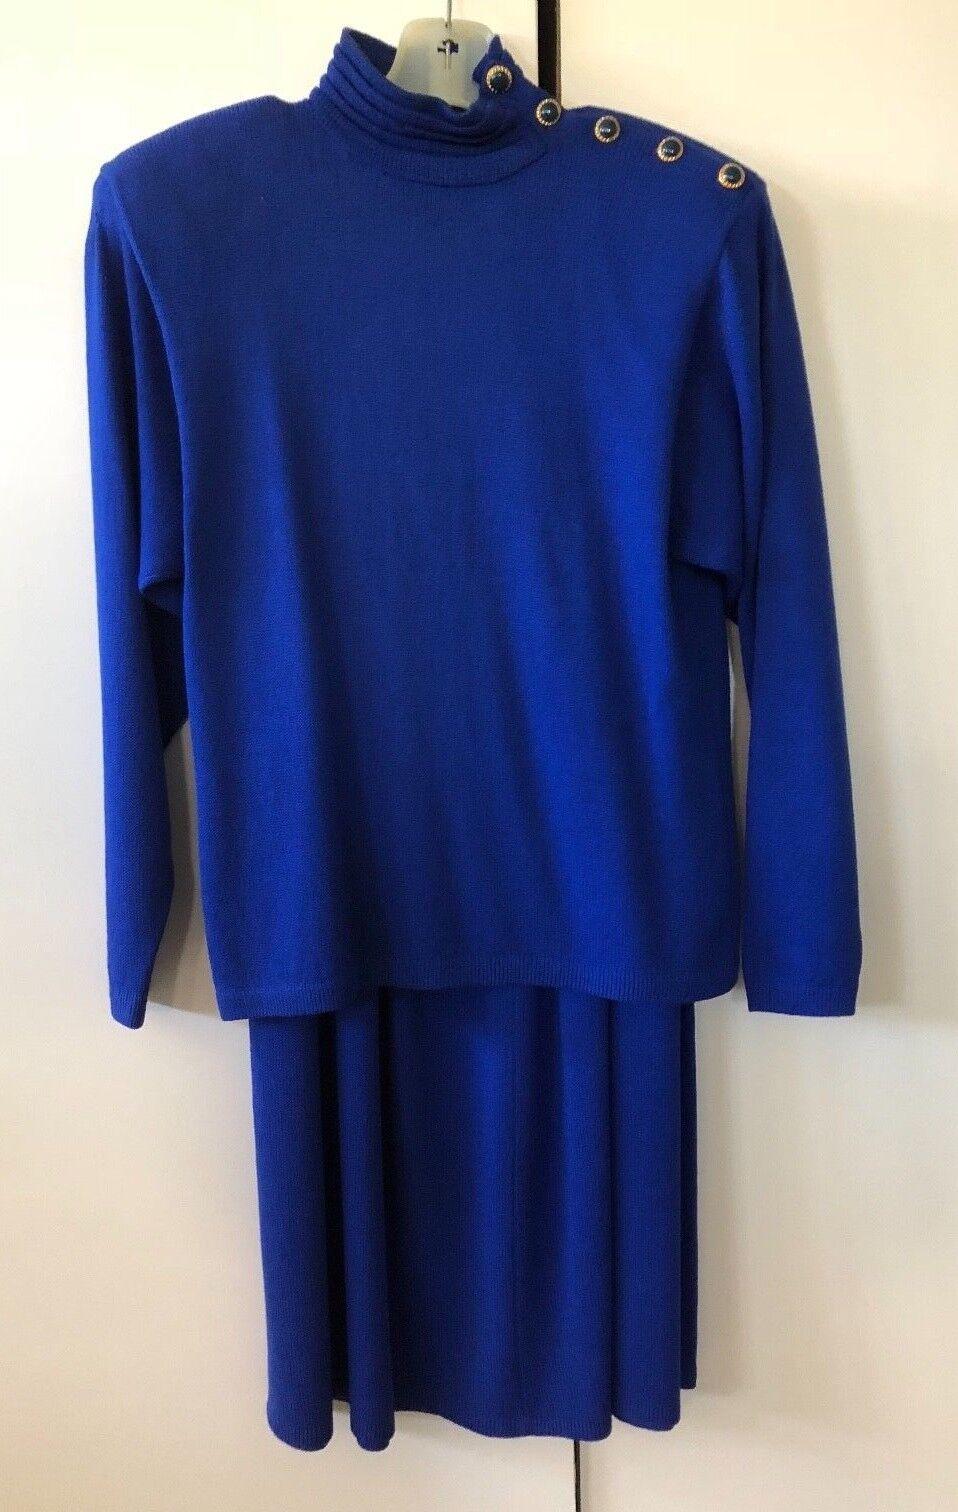 ST. JOHN NEIMAN MARCUS Women's bluee Knit Top and Skirt - Size 8  (5086)